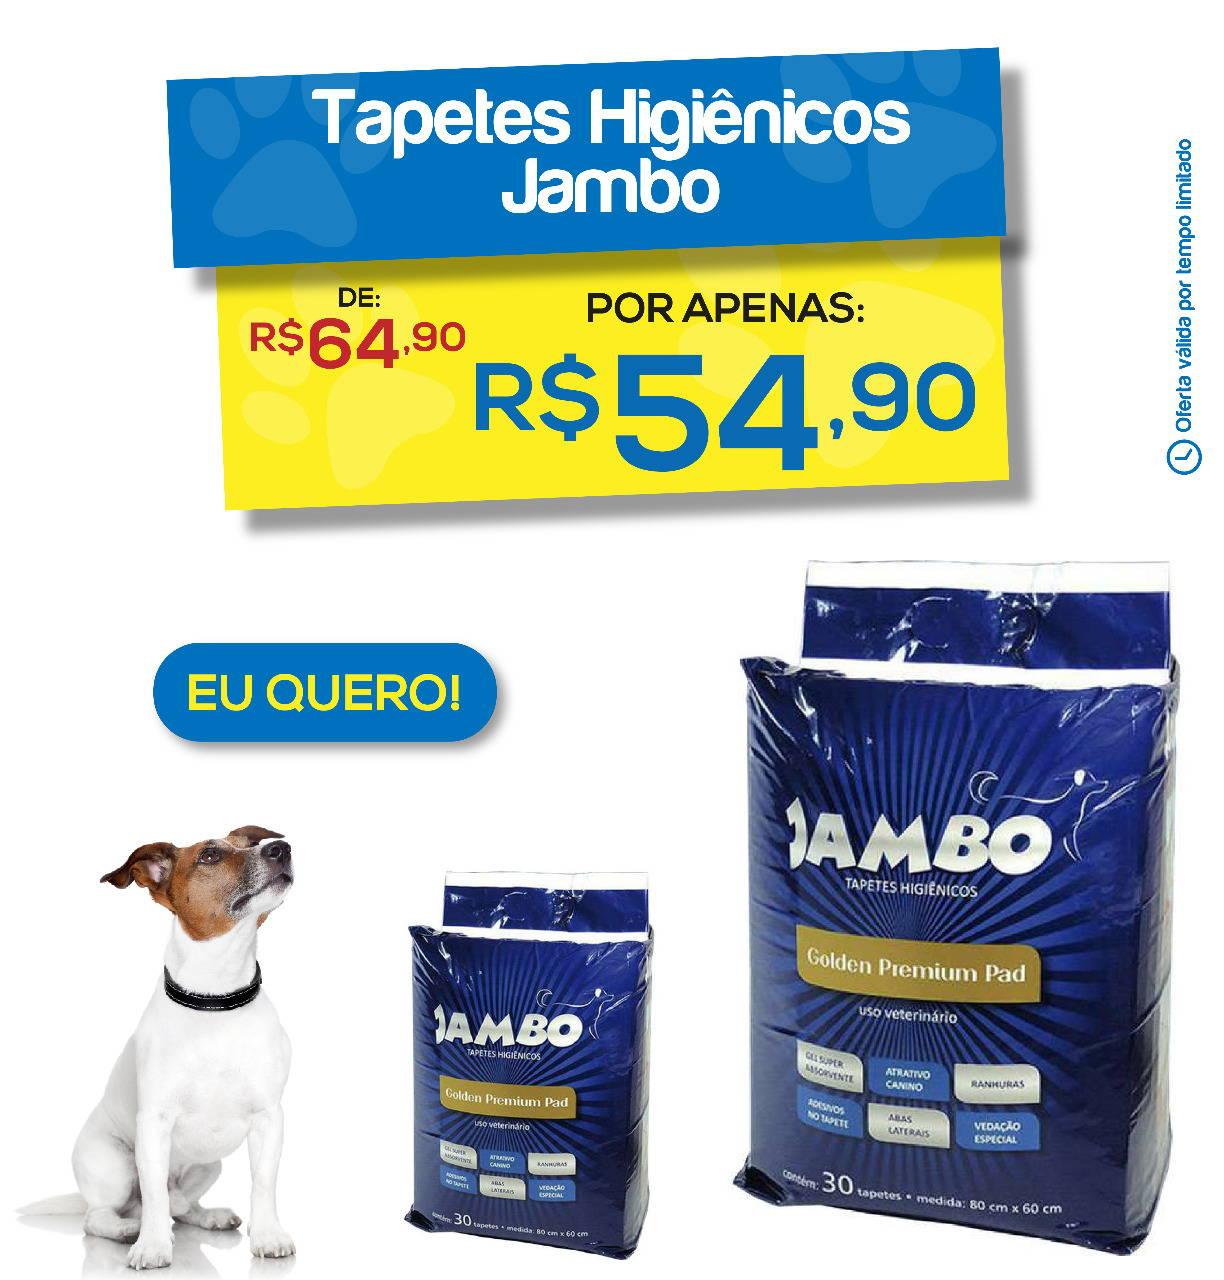 Tapete Higiênico Jambo Golden Premium